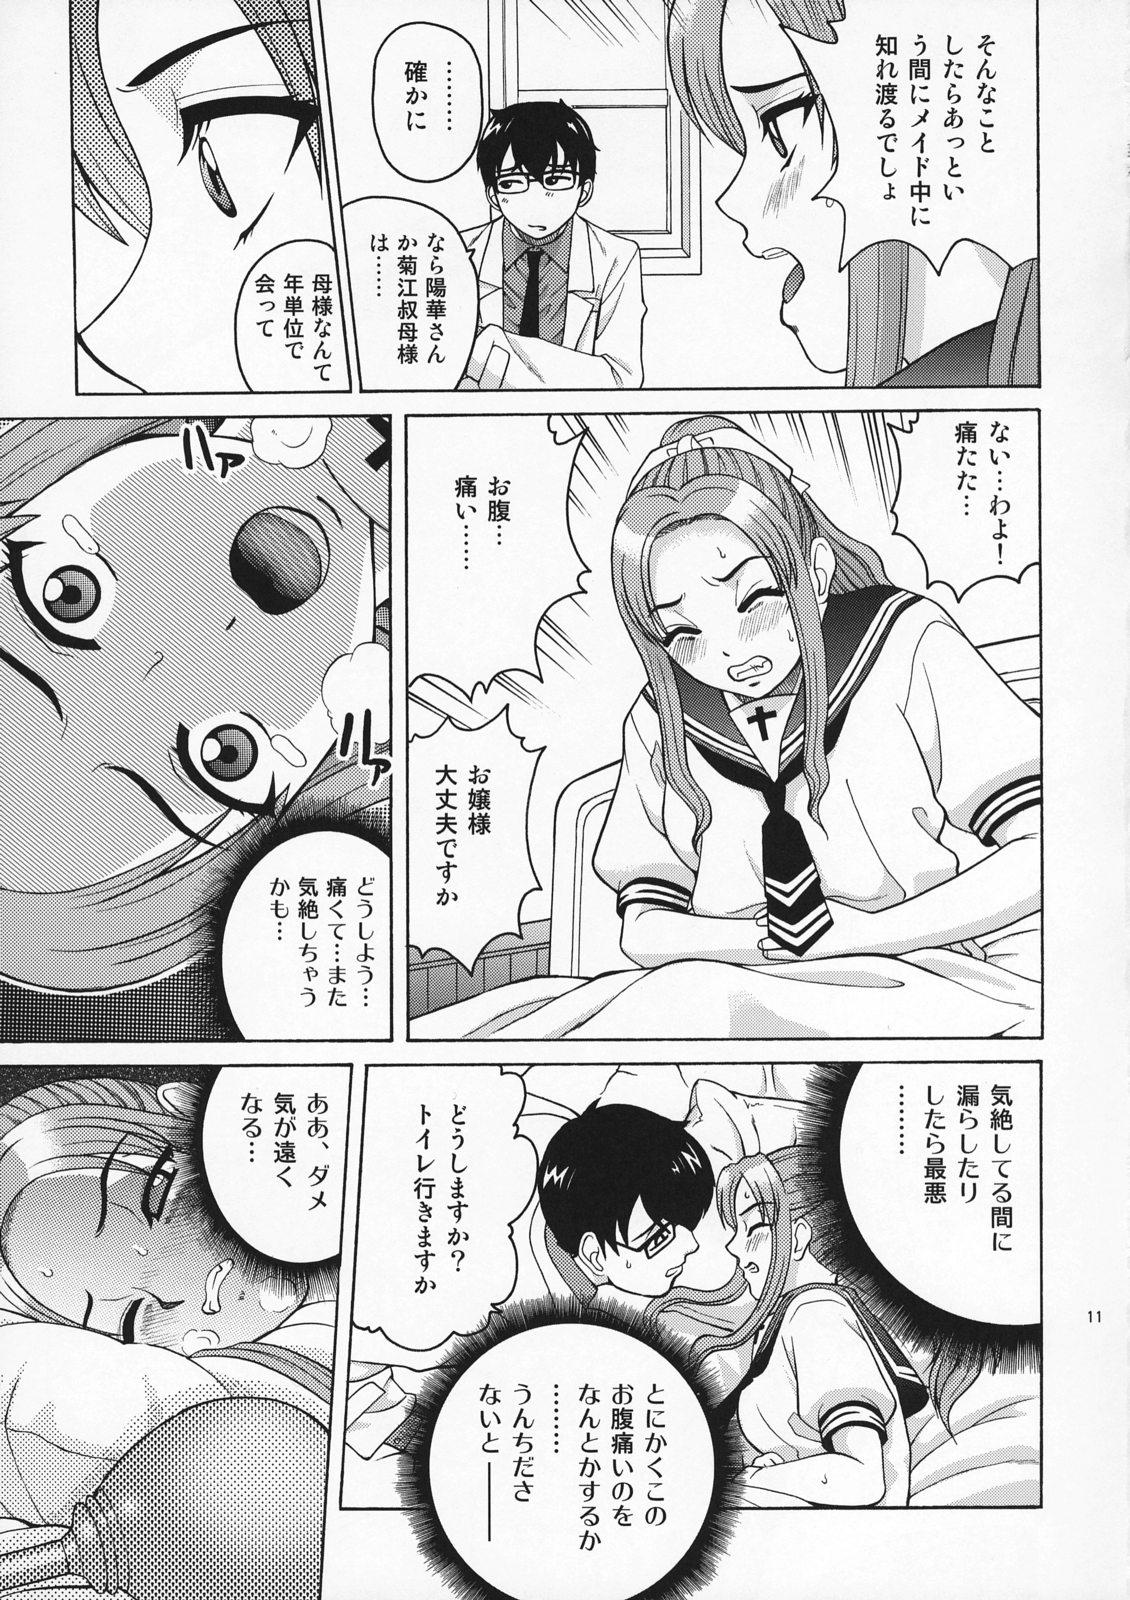 (C72) [Cool Brain (Kitani Sai)] ANGEL PAIN Extra 4 -Ojou-sama Scatology- 9